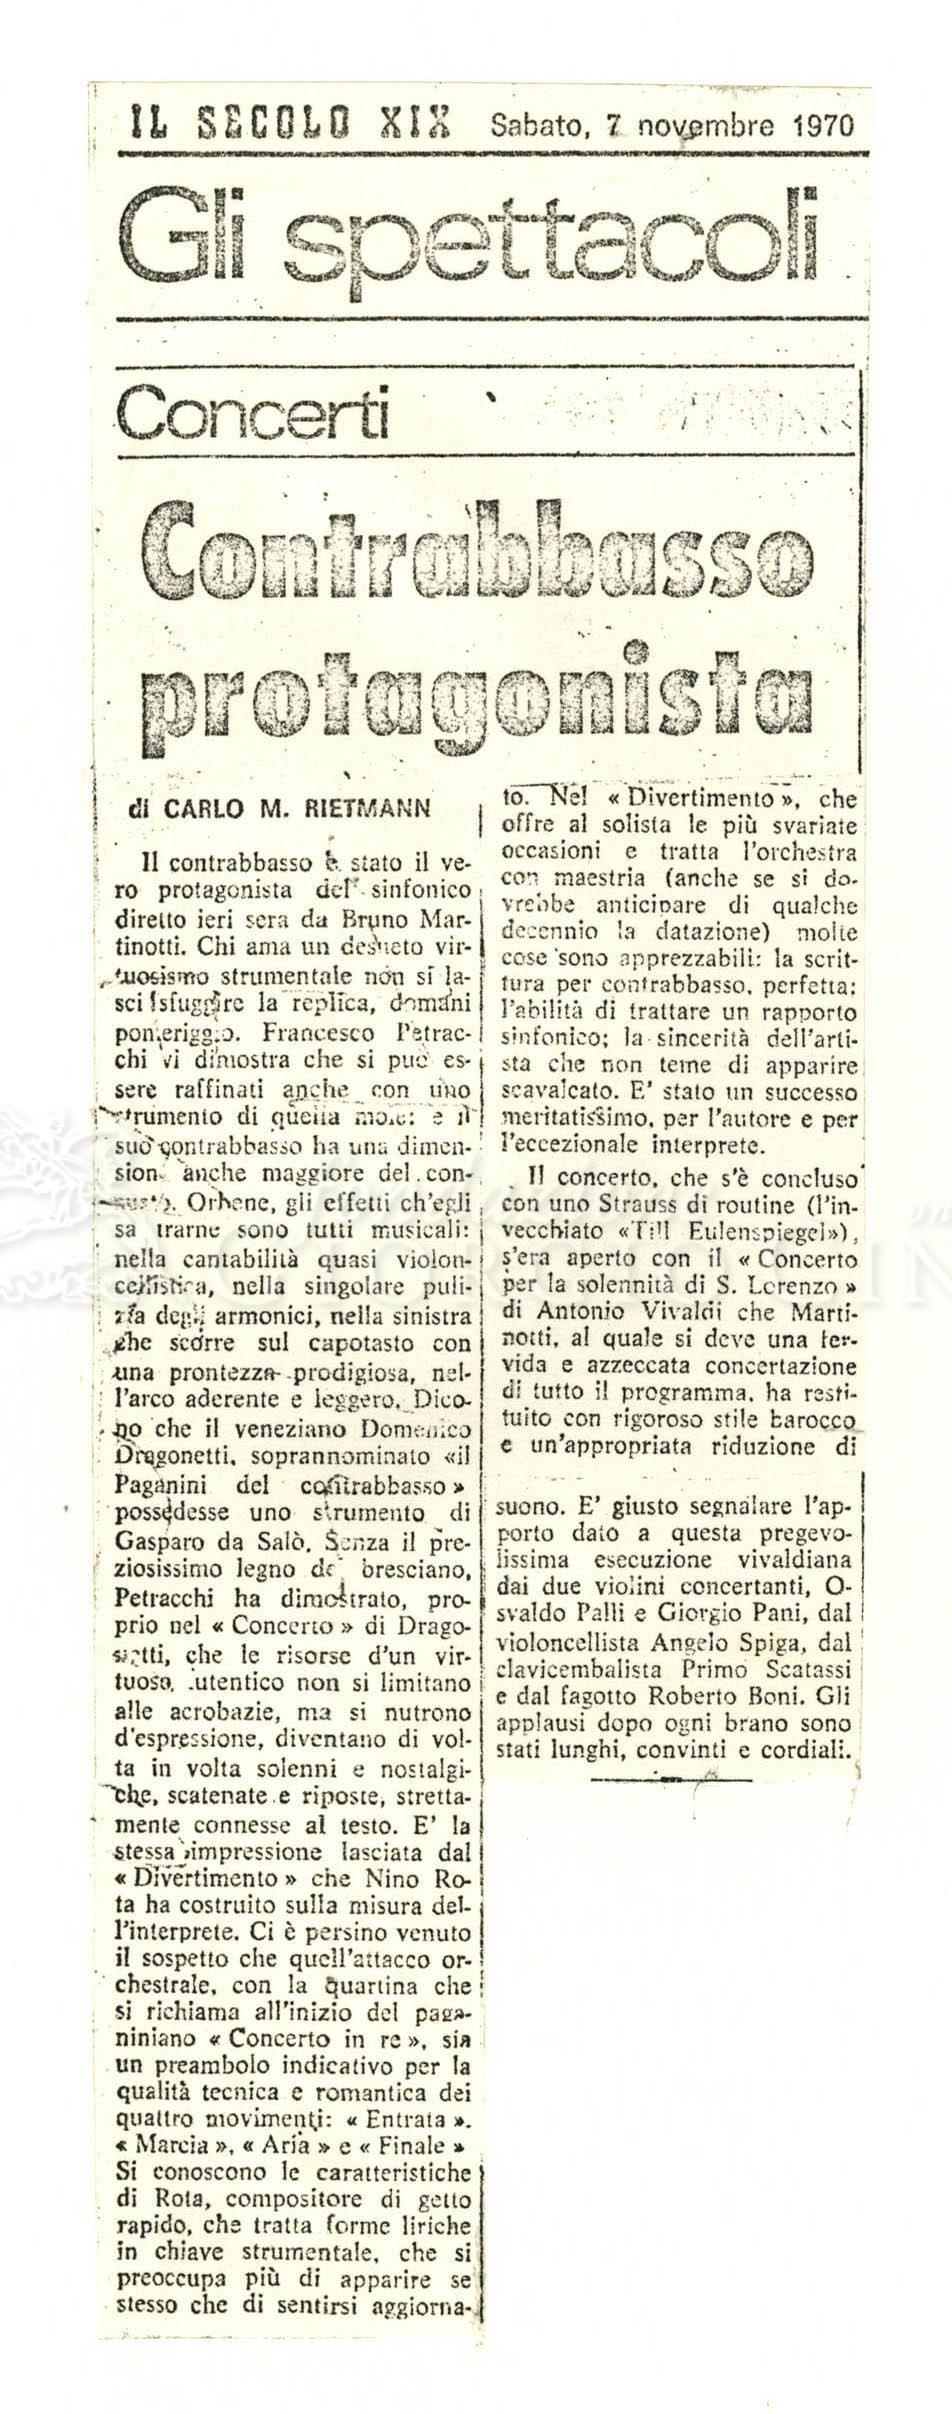 Contrabbasso protagonista  07 novembre 1970